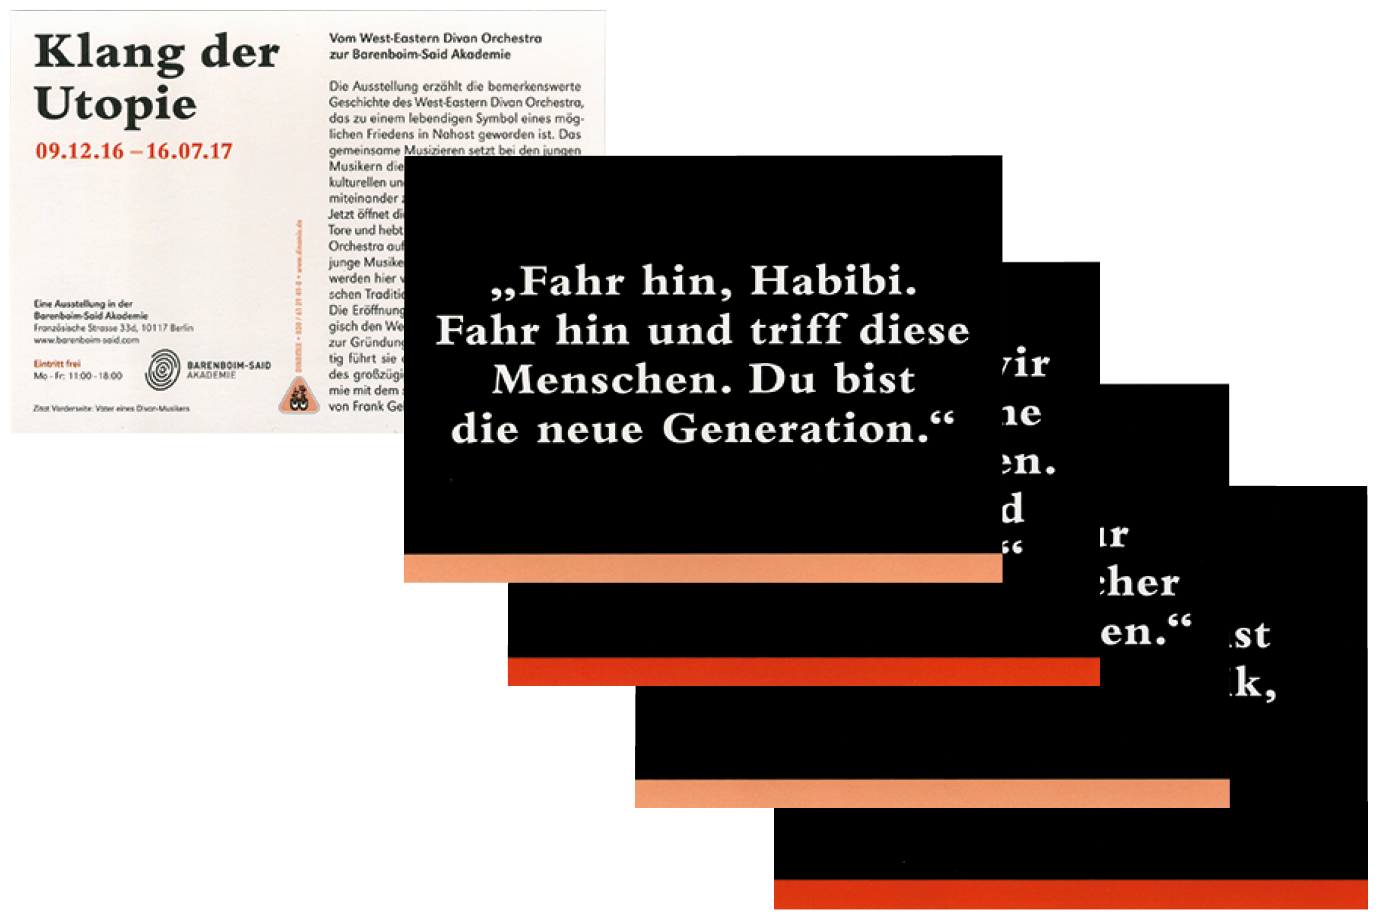 http://e-o-t.de/wordpress/wp-content/uploads/2017/02/2014_eot-Barenboim-Said-Identity-06.jpg